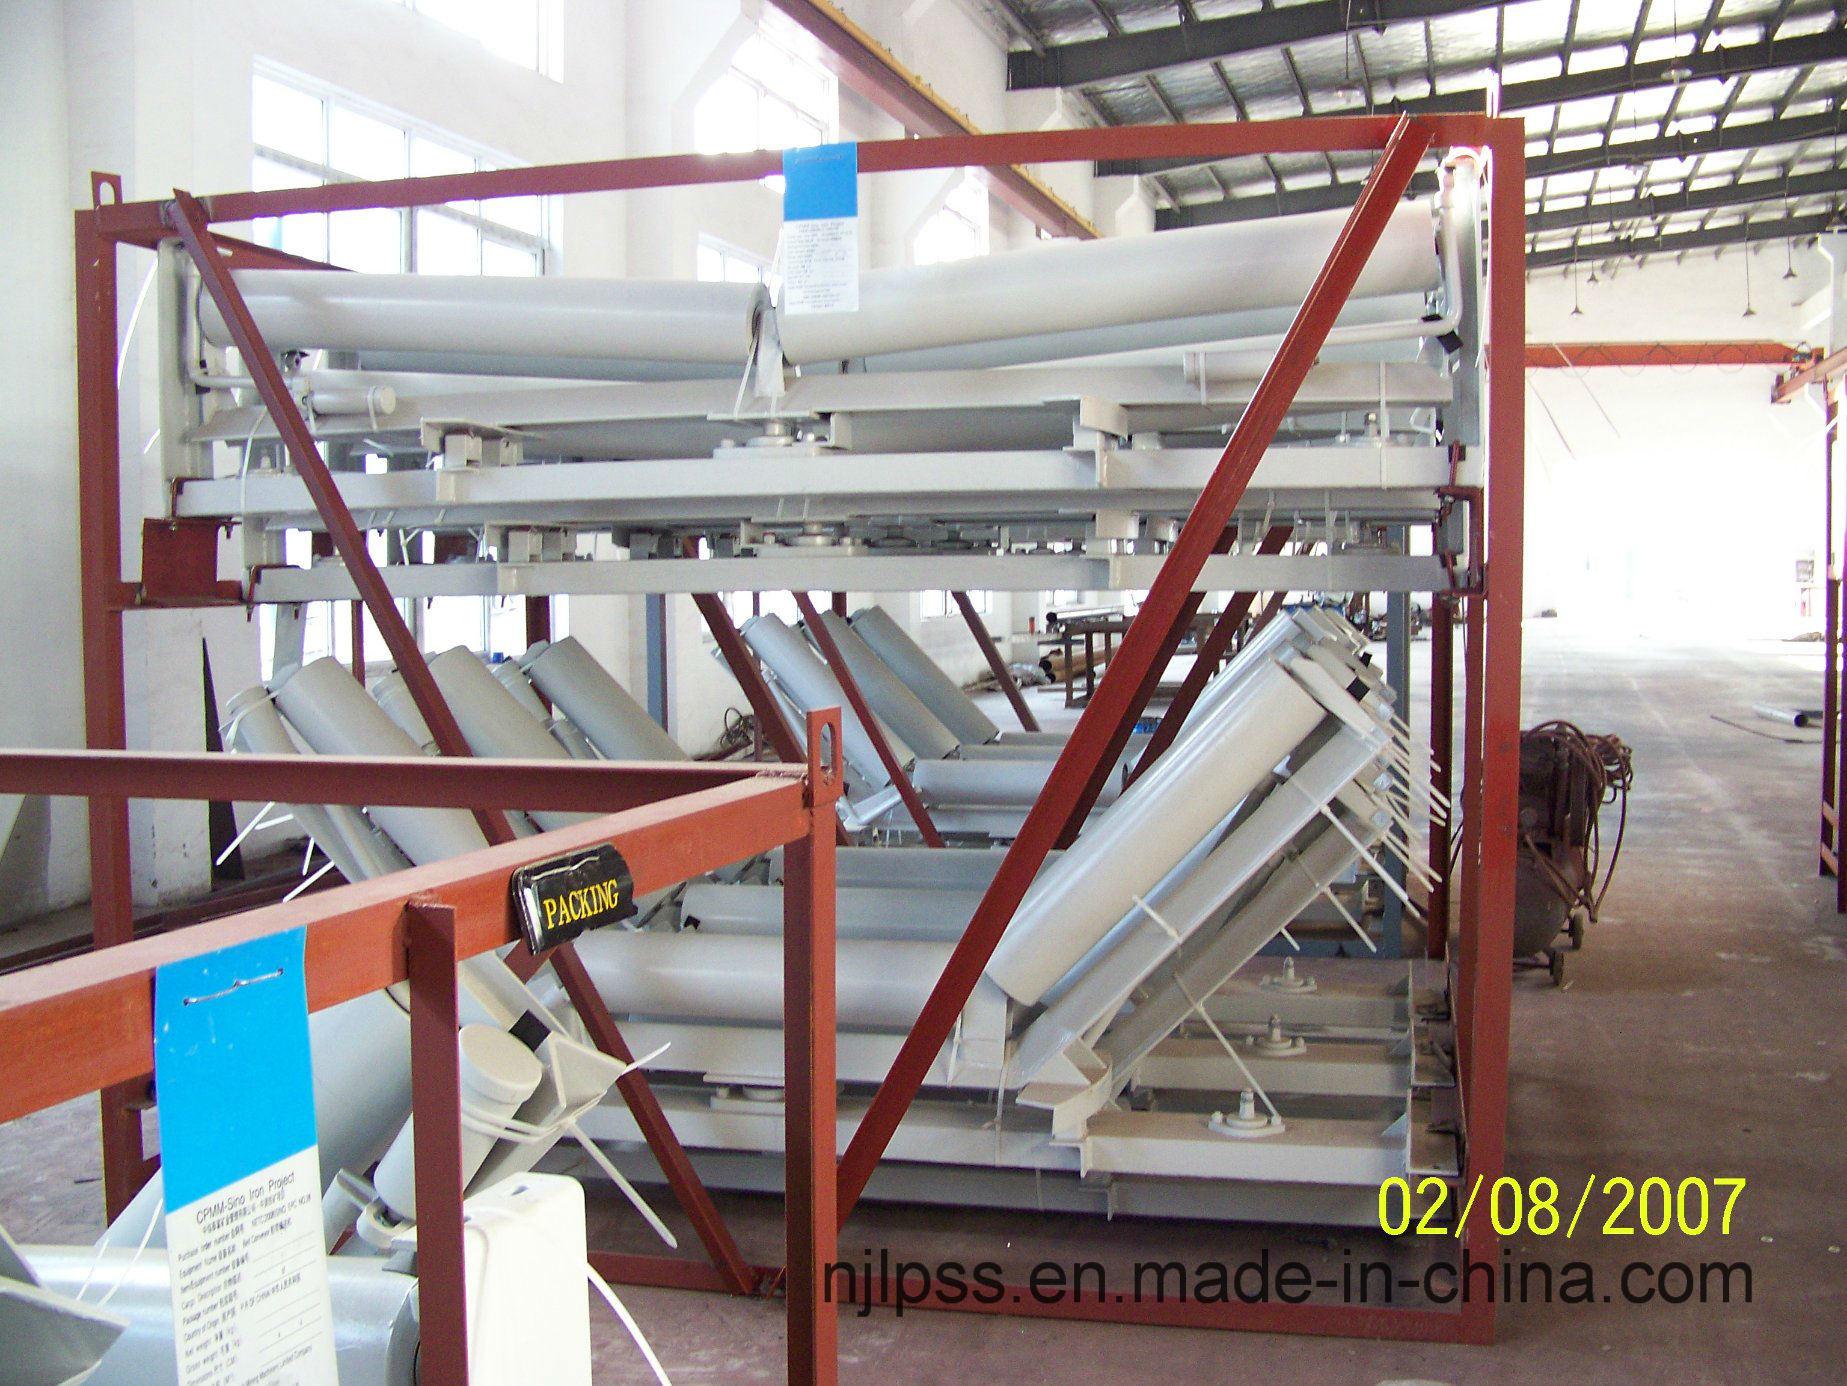 Carrier Self Aligning Roller Group for Belt Conveyor Zds-S-2